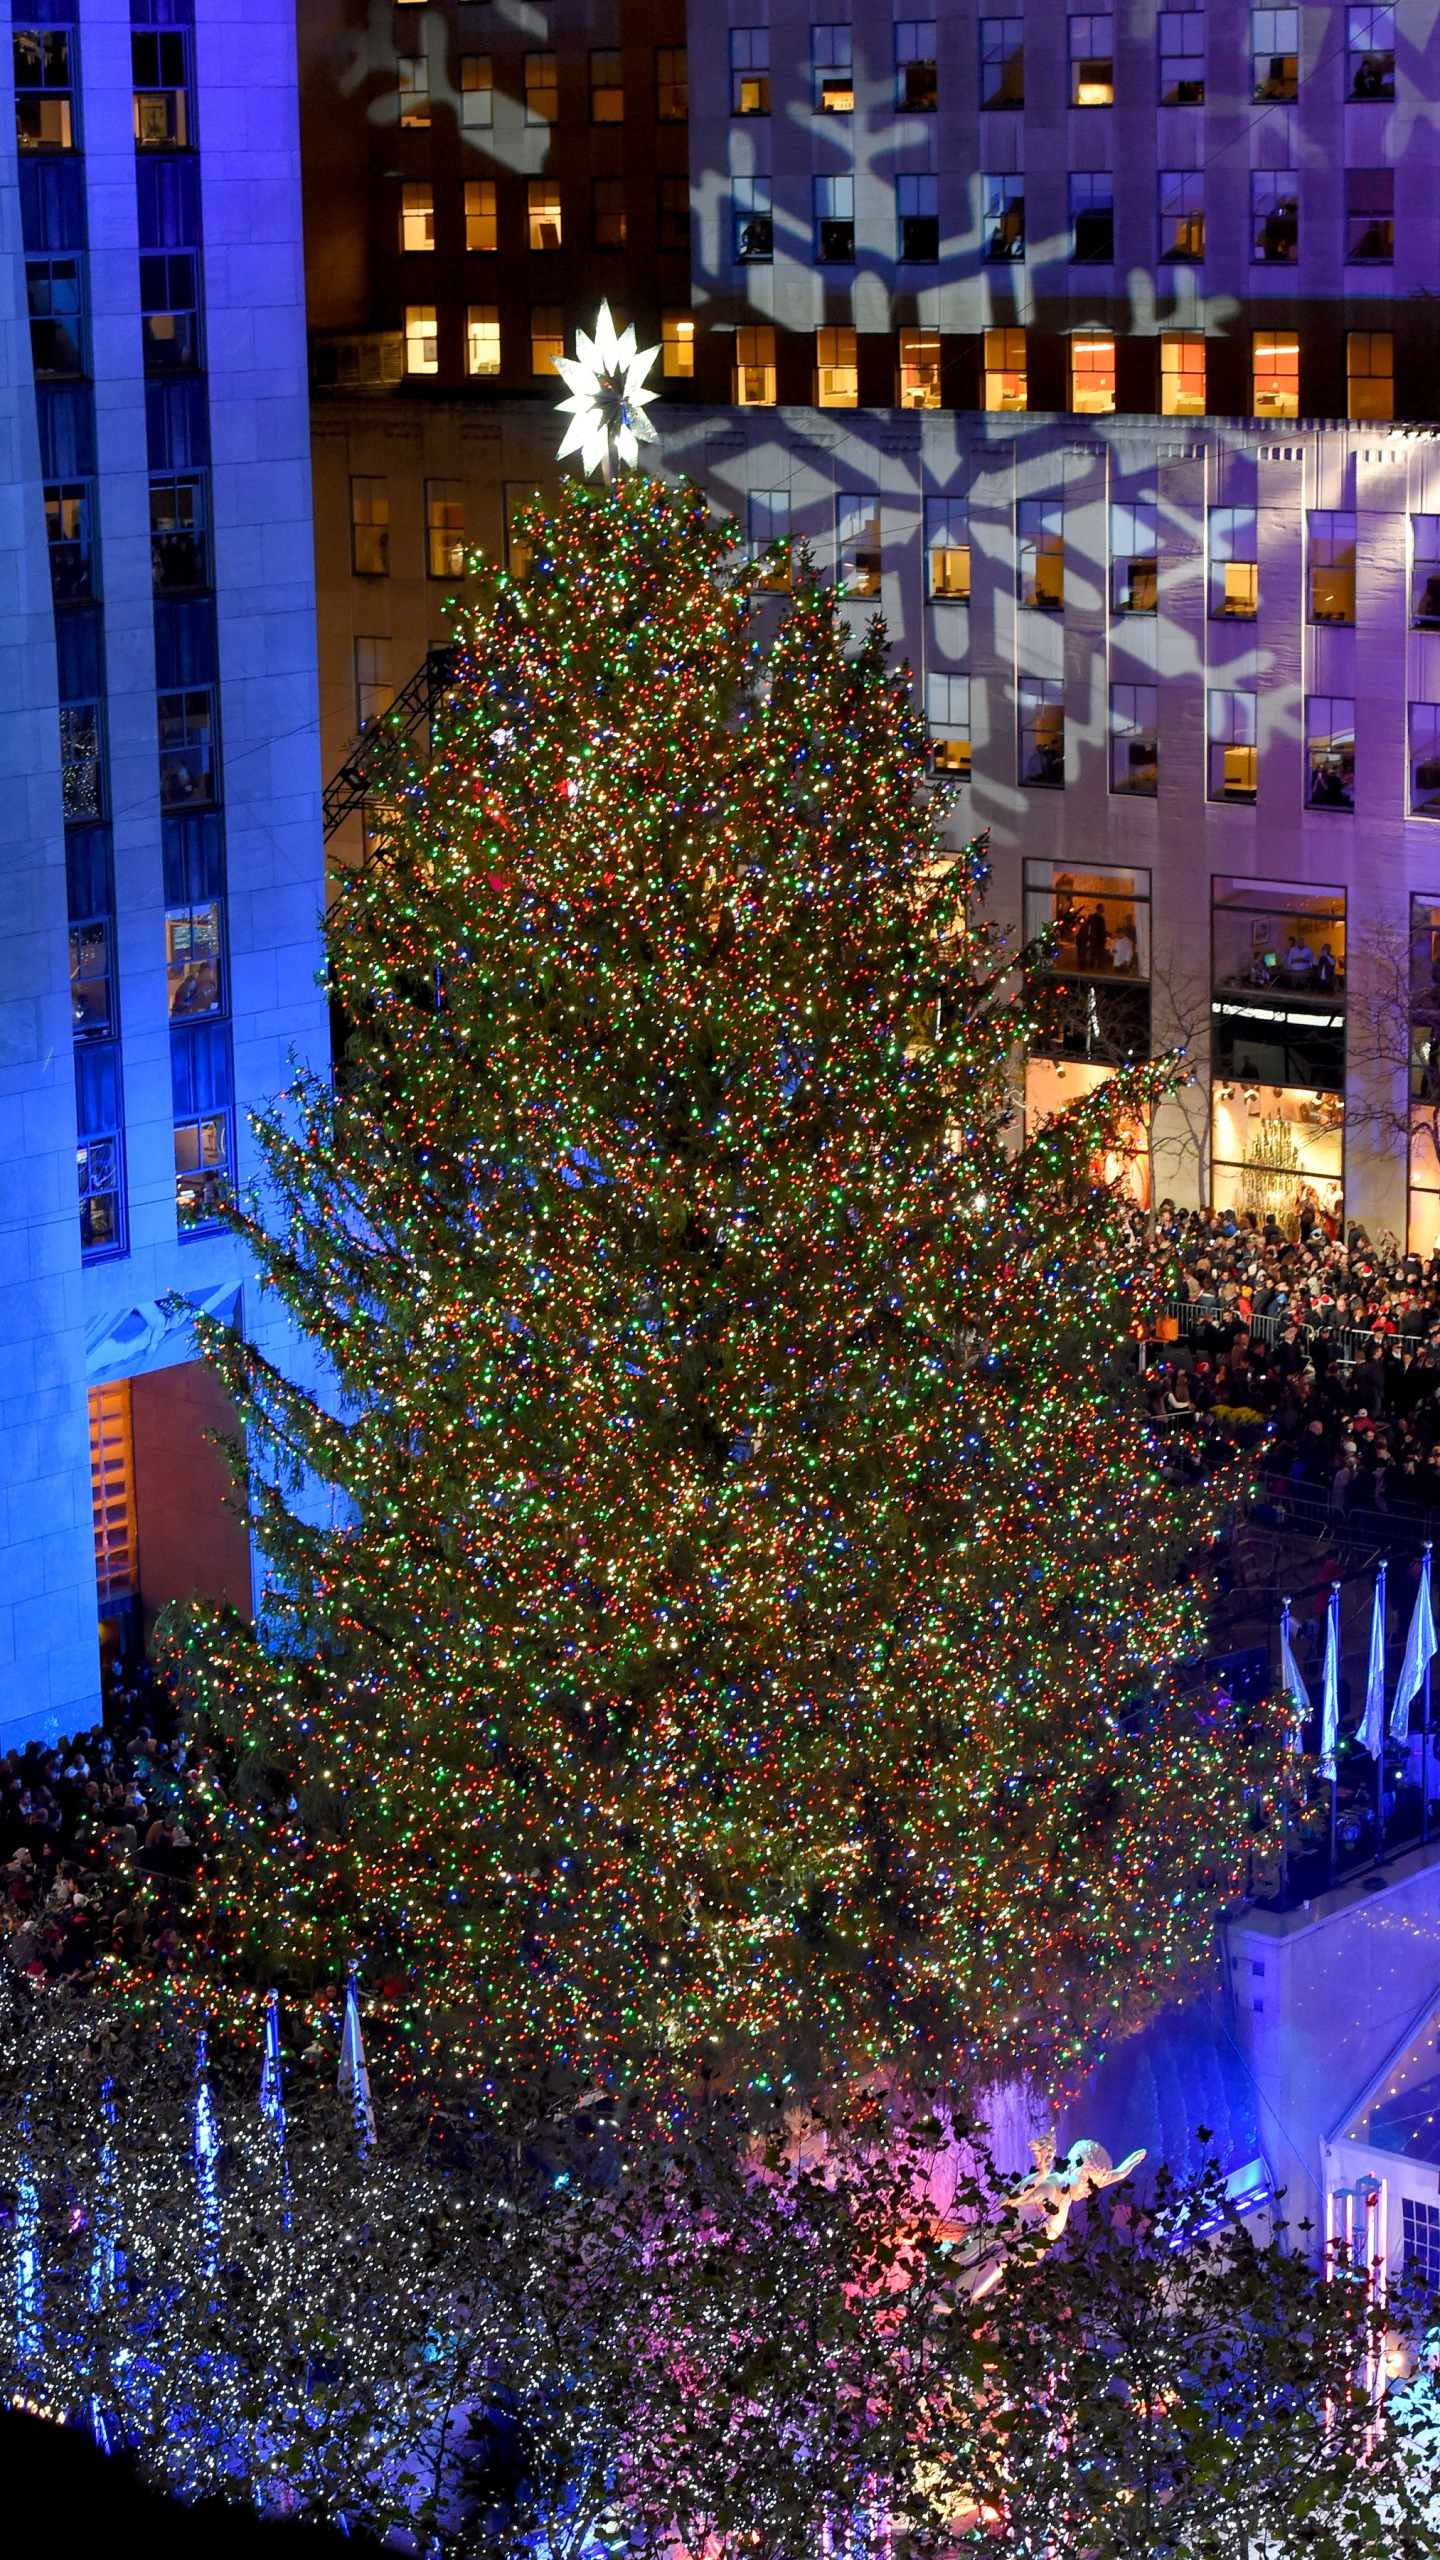 rockefeller christmas tree lighting attracts thousands https www krqe com news rockefeller christmas tree lighting attracts thousands